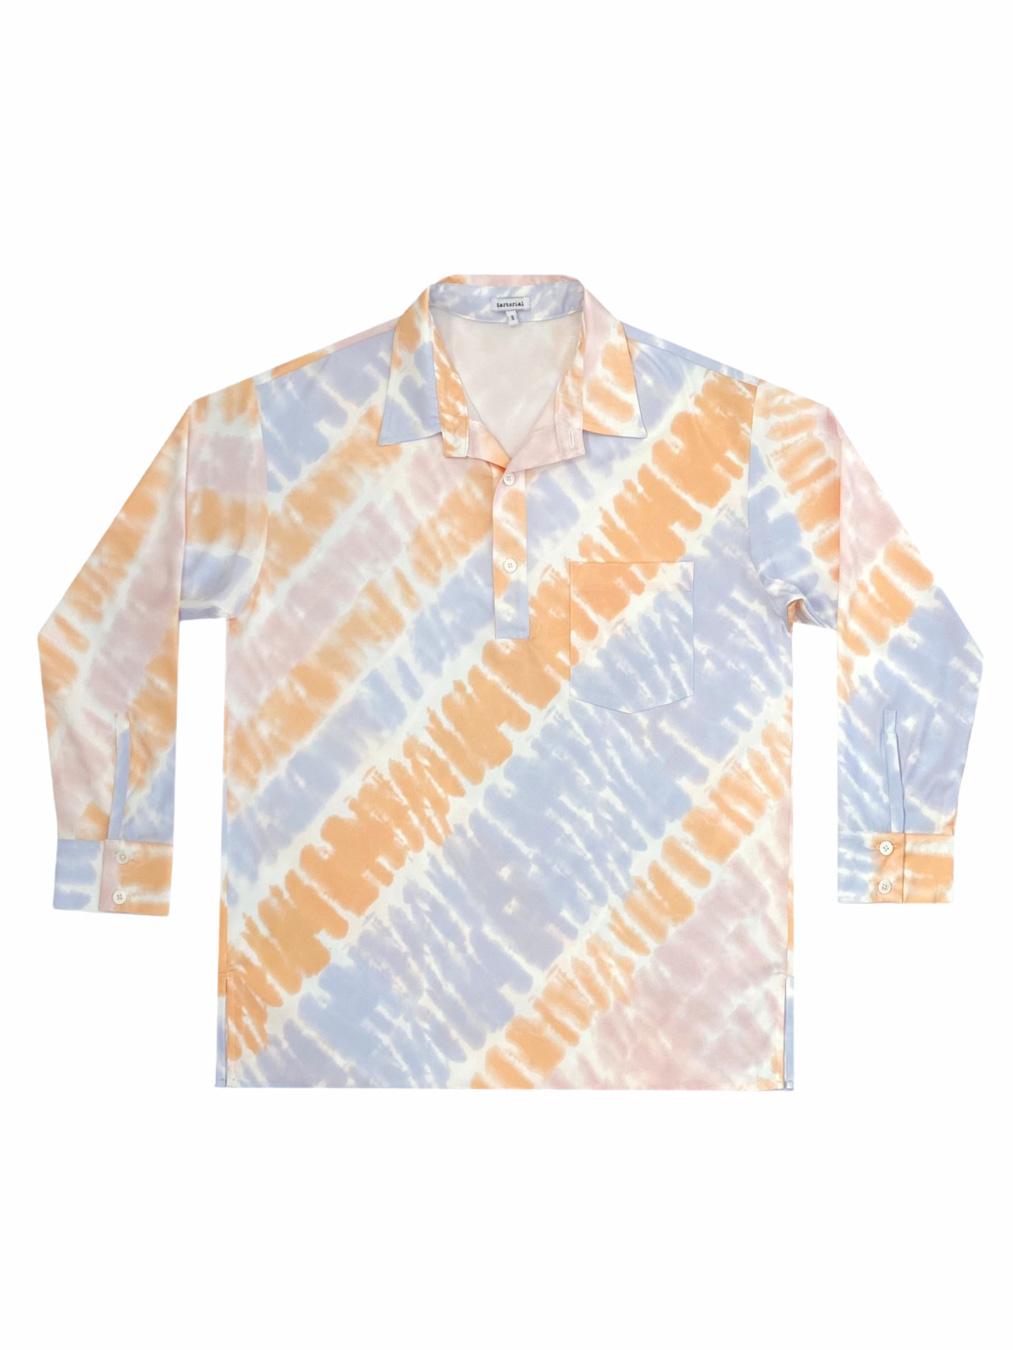 Pyjamas Tie - Dye Oversized Shirt (Orange)